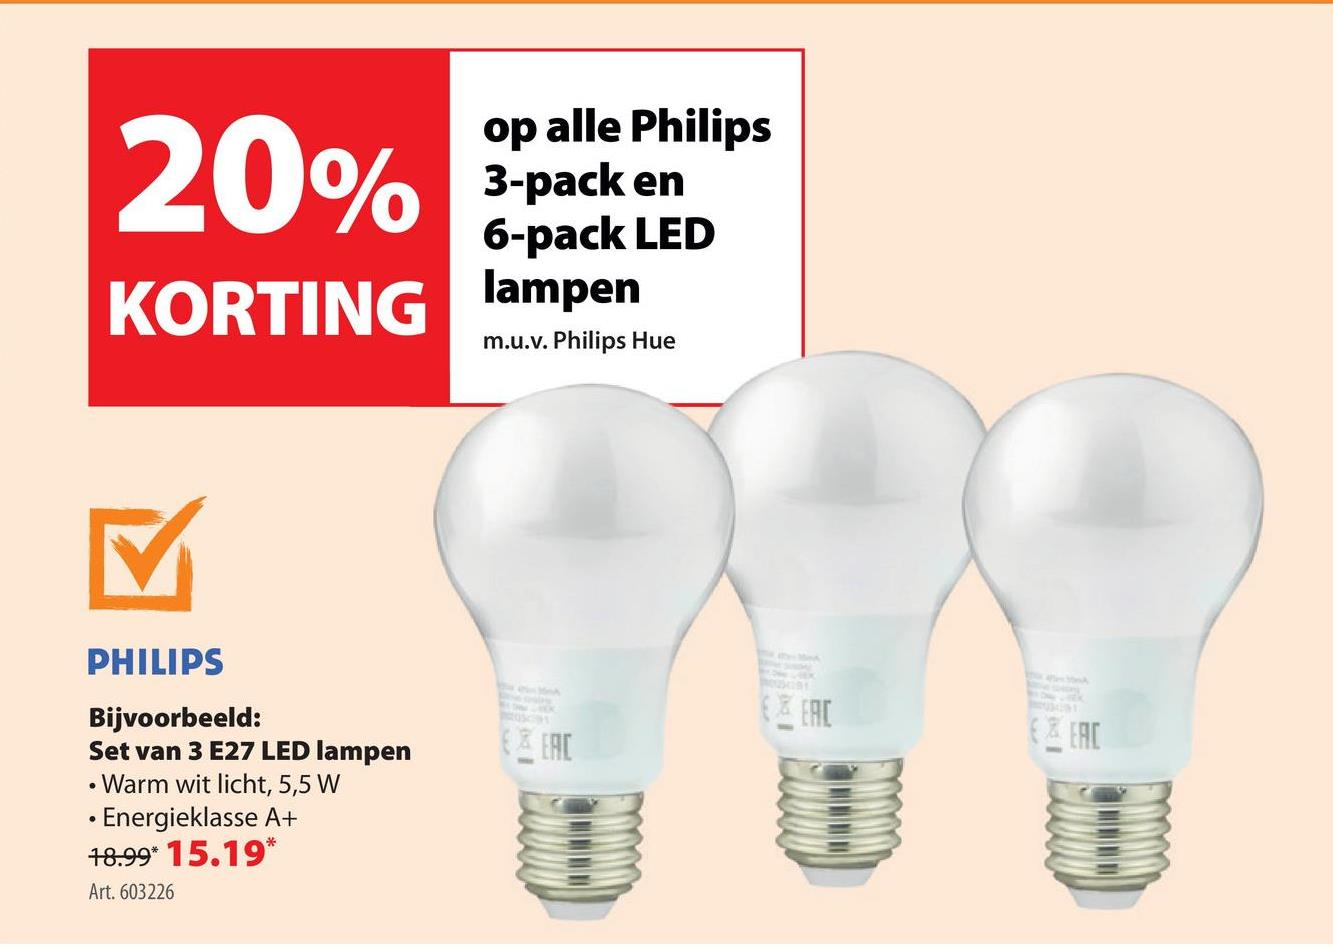 0/ op alle Philips 3-pack en 6-pack LED lampen KORTING m.u.v. Philips Hue PHILIPS Bijvoorbeeld: Set van 3 E27 LED lampen • Warm wit licht, 5,5 W • Energieklasse A+ 78.99* 15.19* Art. 603226